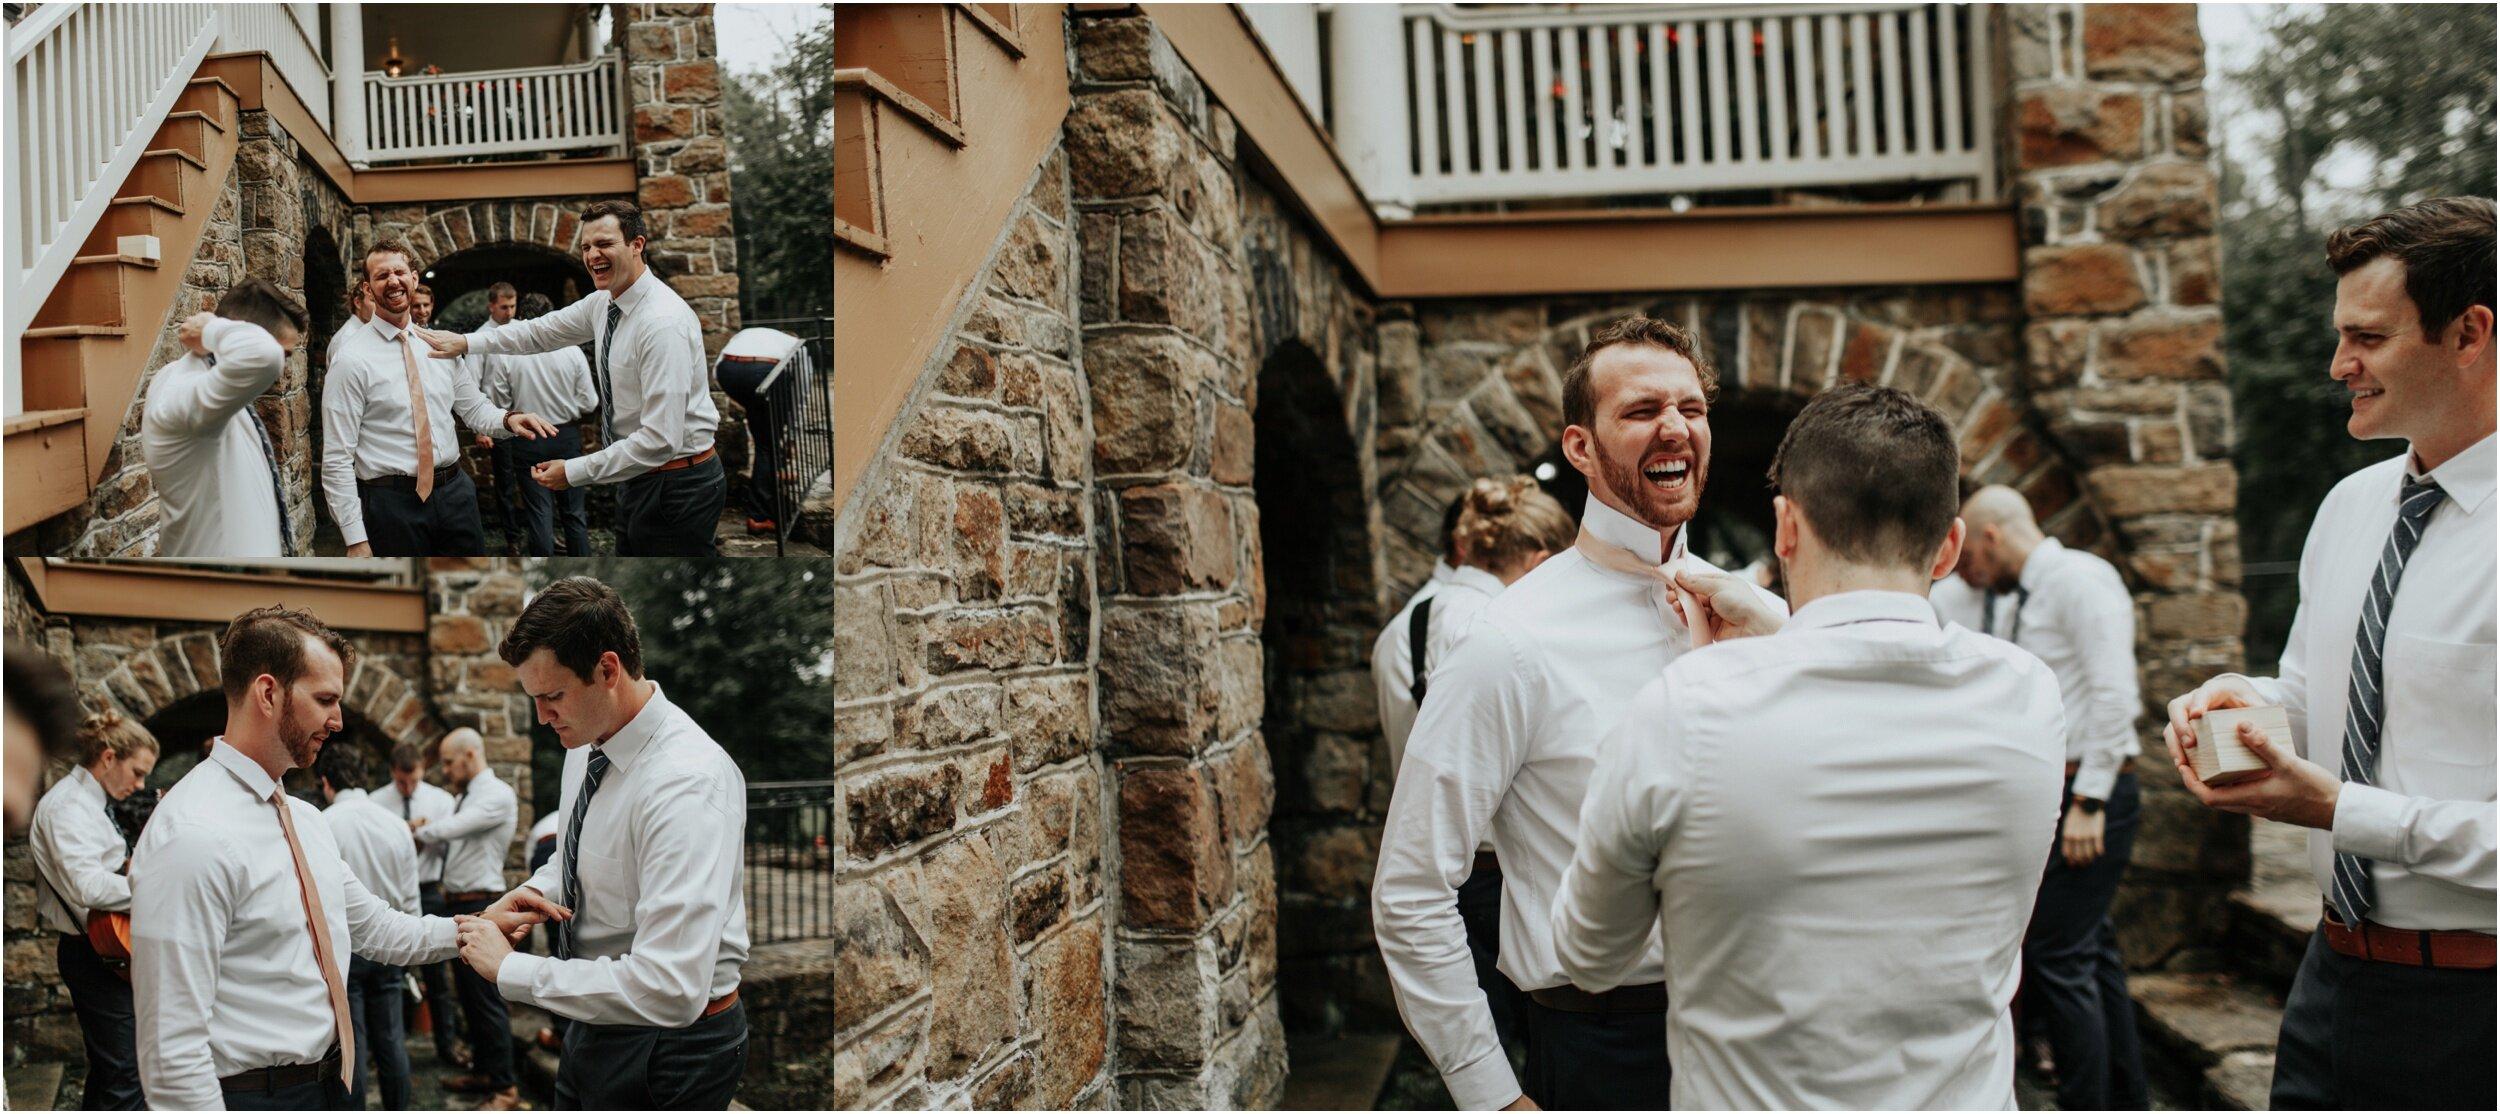 steph-and-jordan-cox-our-wedding-historic-shady-lane-compass-wedding-collective-hazel-lining-photography-destination-elopement-wedding-engagement-photography_0024.jpg